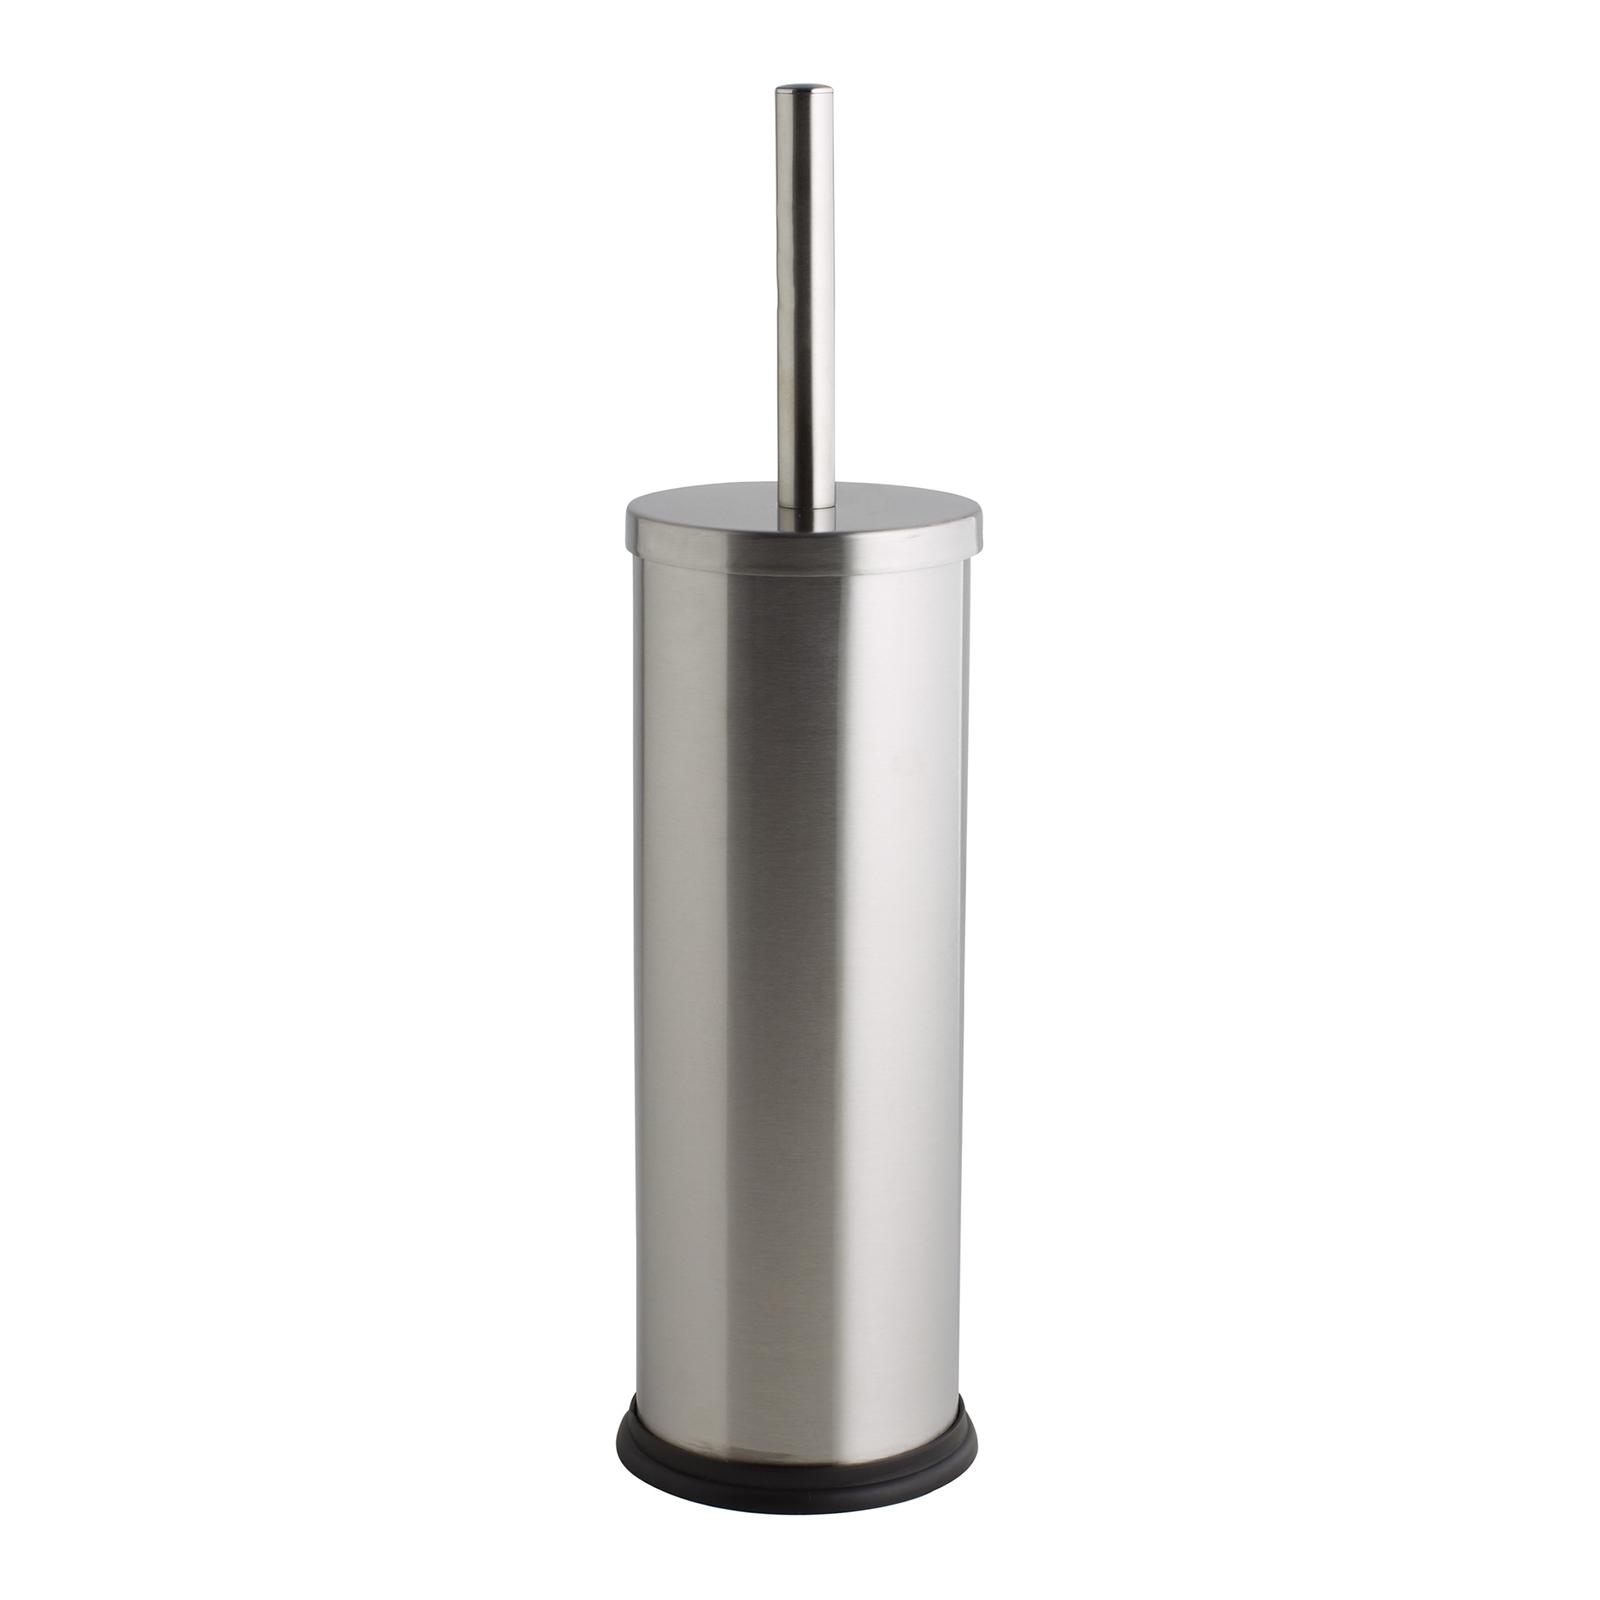 Morgan Stainless Steel Toilet Brush